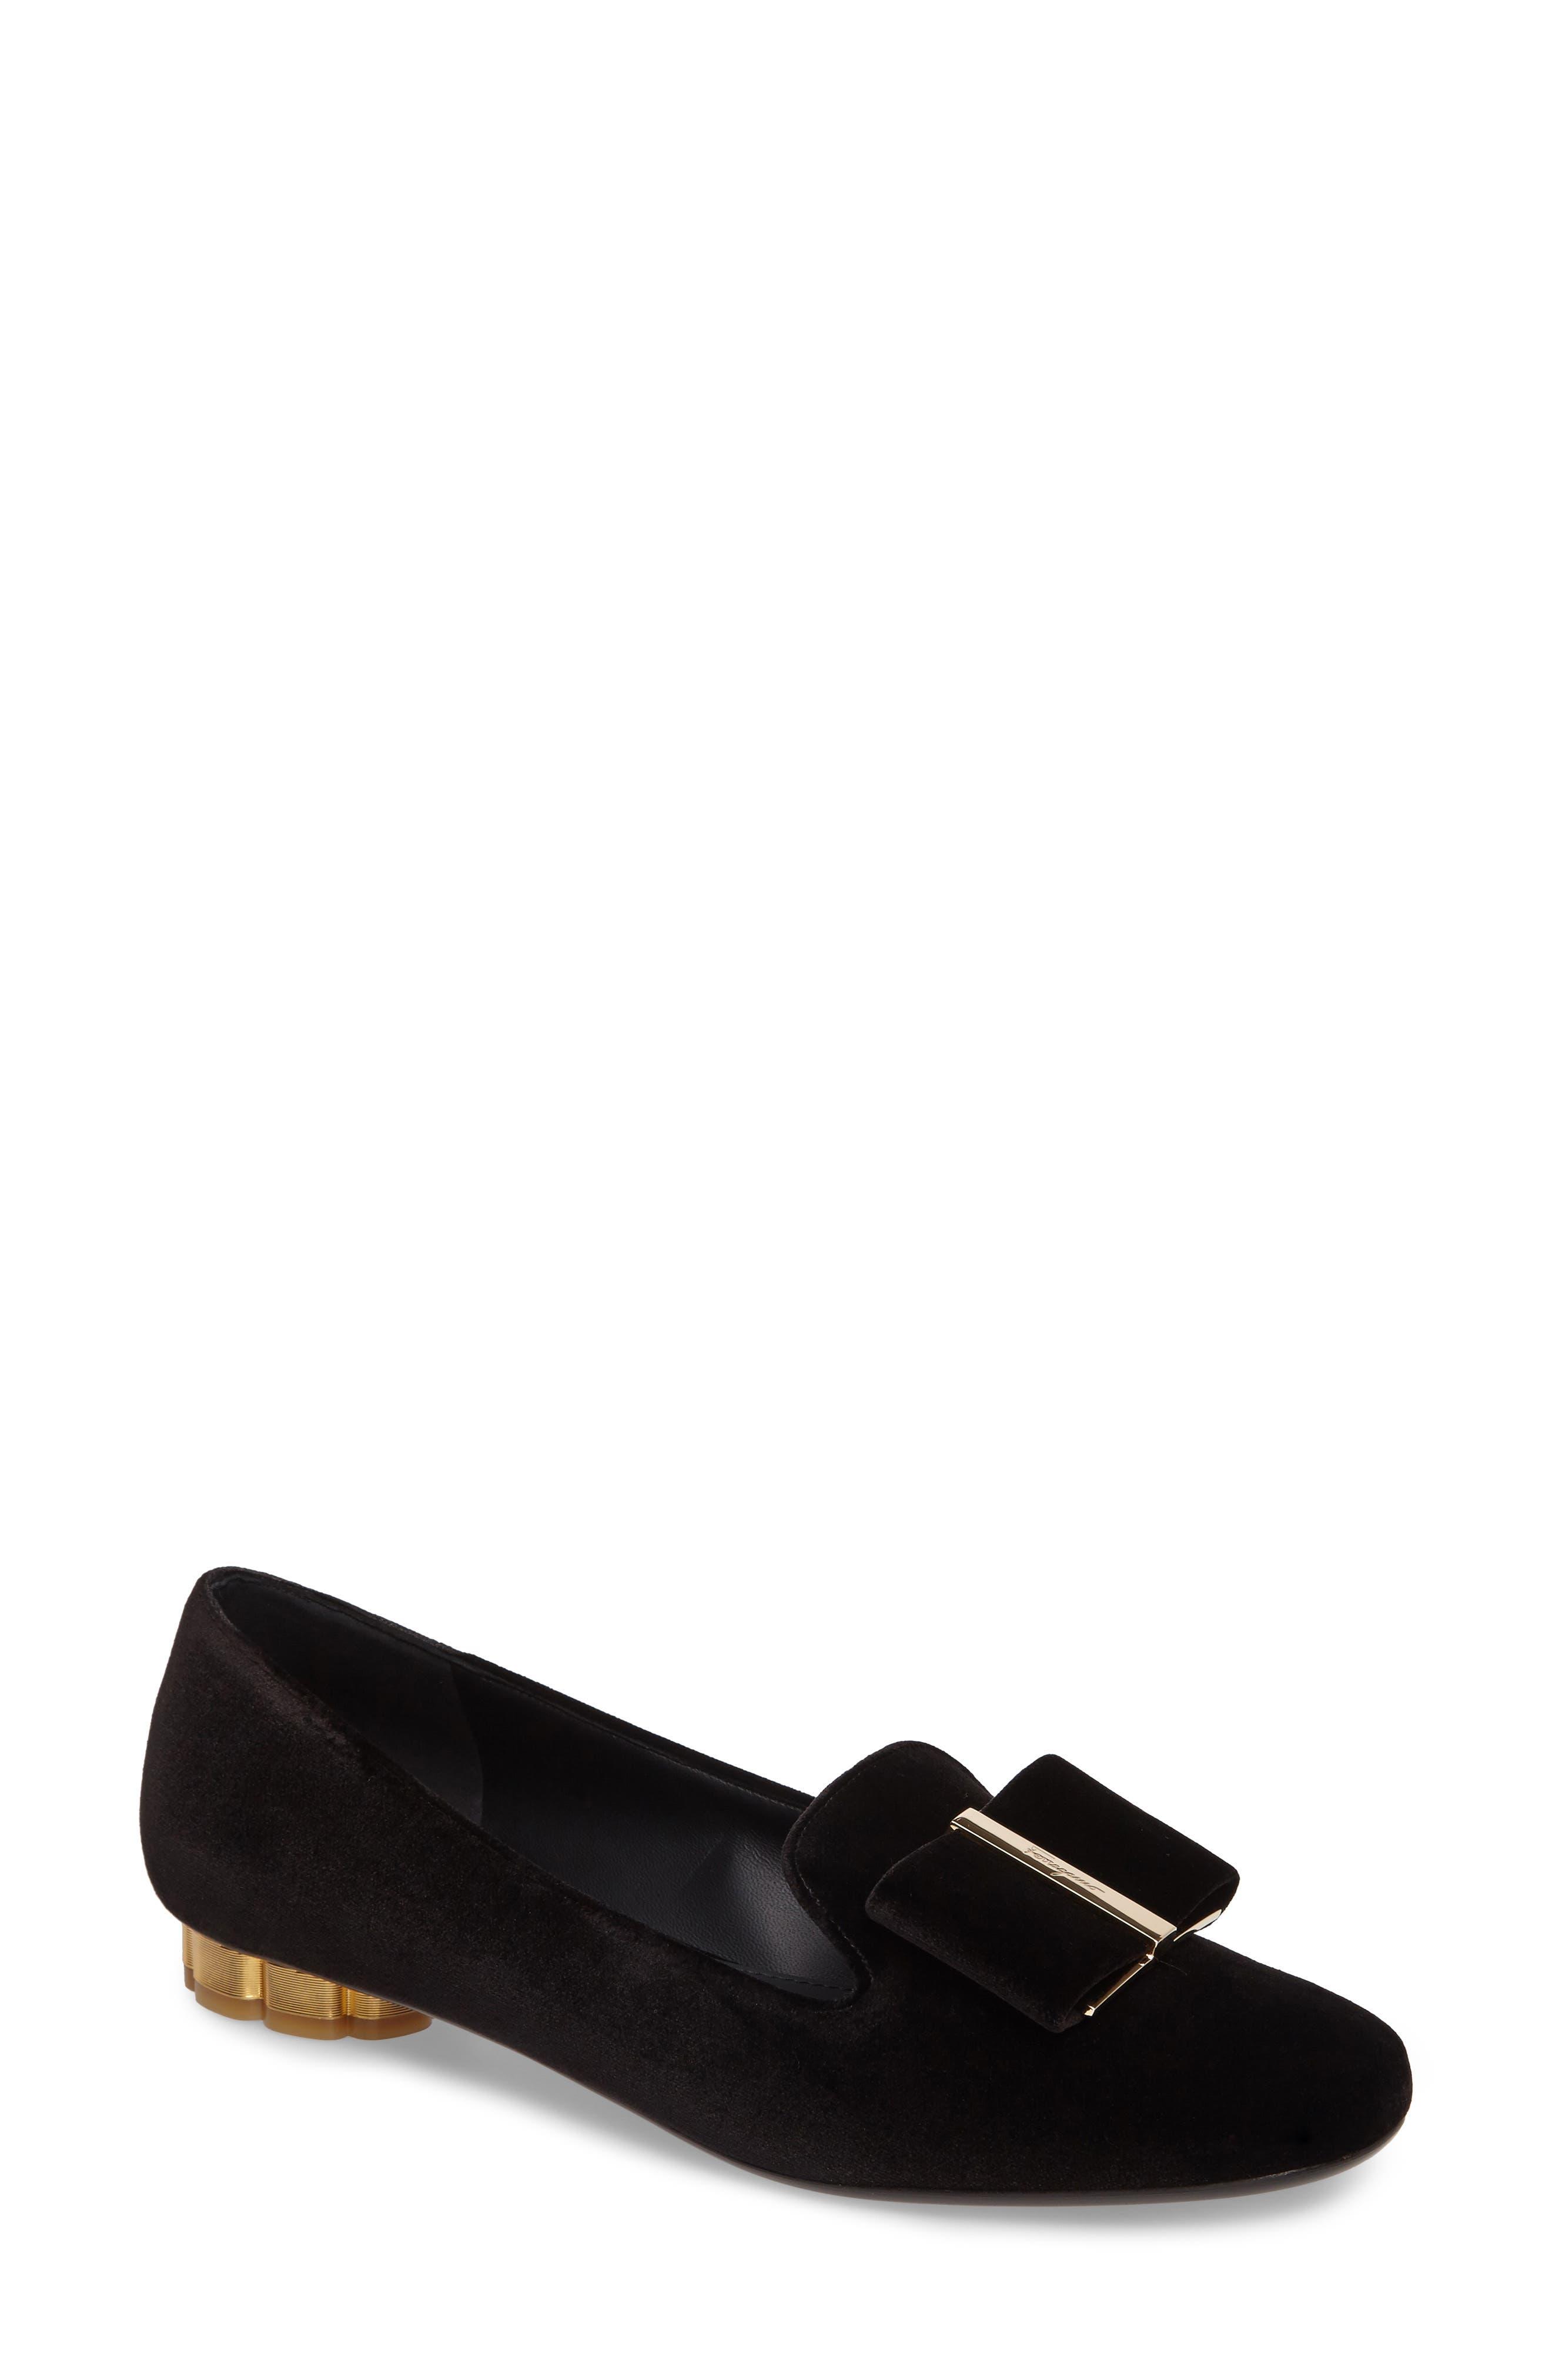 Main Image - Salvatore Ferragamo Sarno Flower Heel Smoking Loafer (Women)